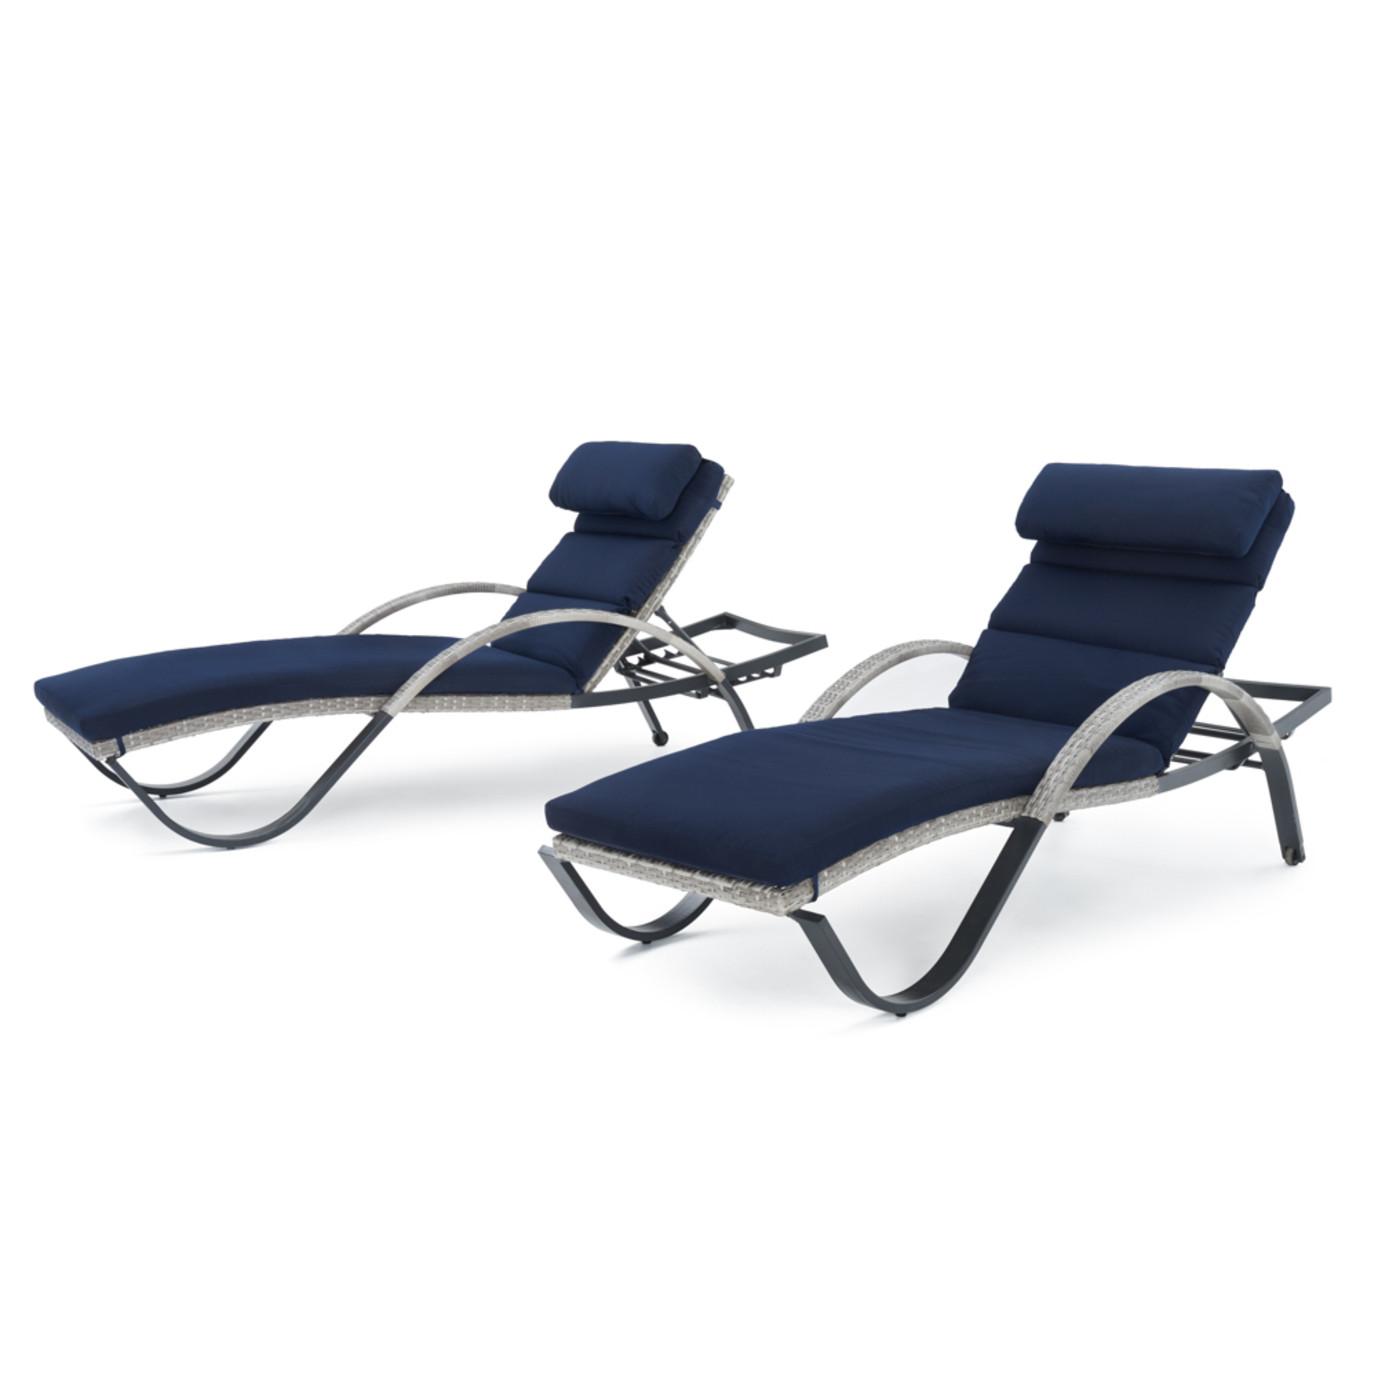 Cannes™ 20 Piece Outdoor Estate Set - Navy Blue